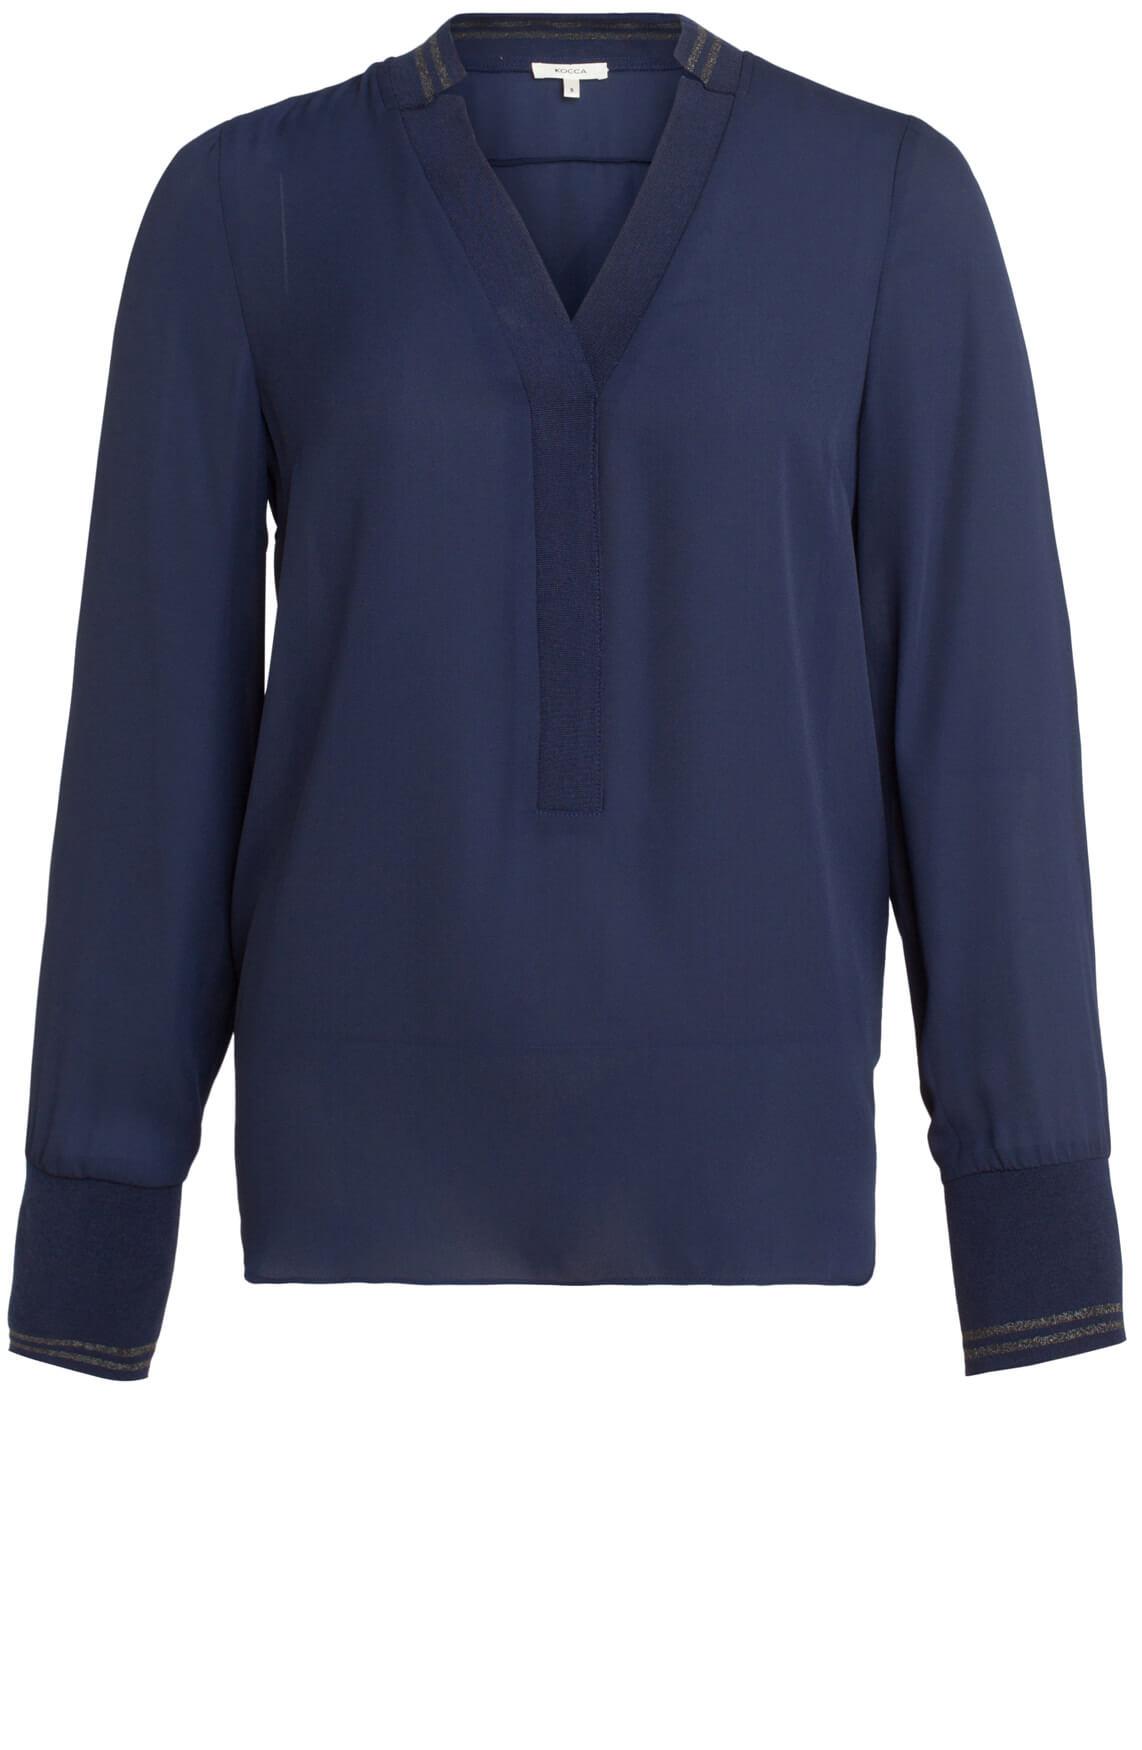 Kocca Dames Mito blauwe blouse Blauw